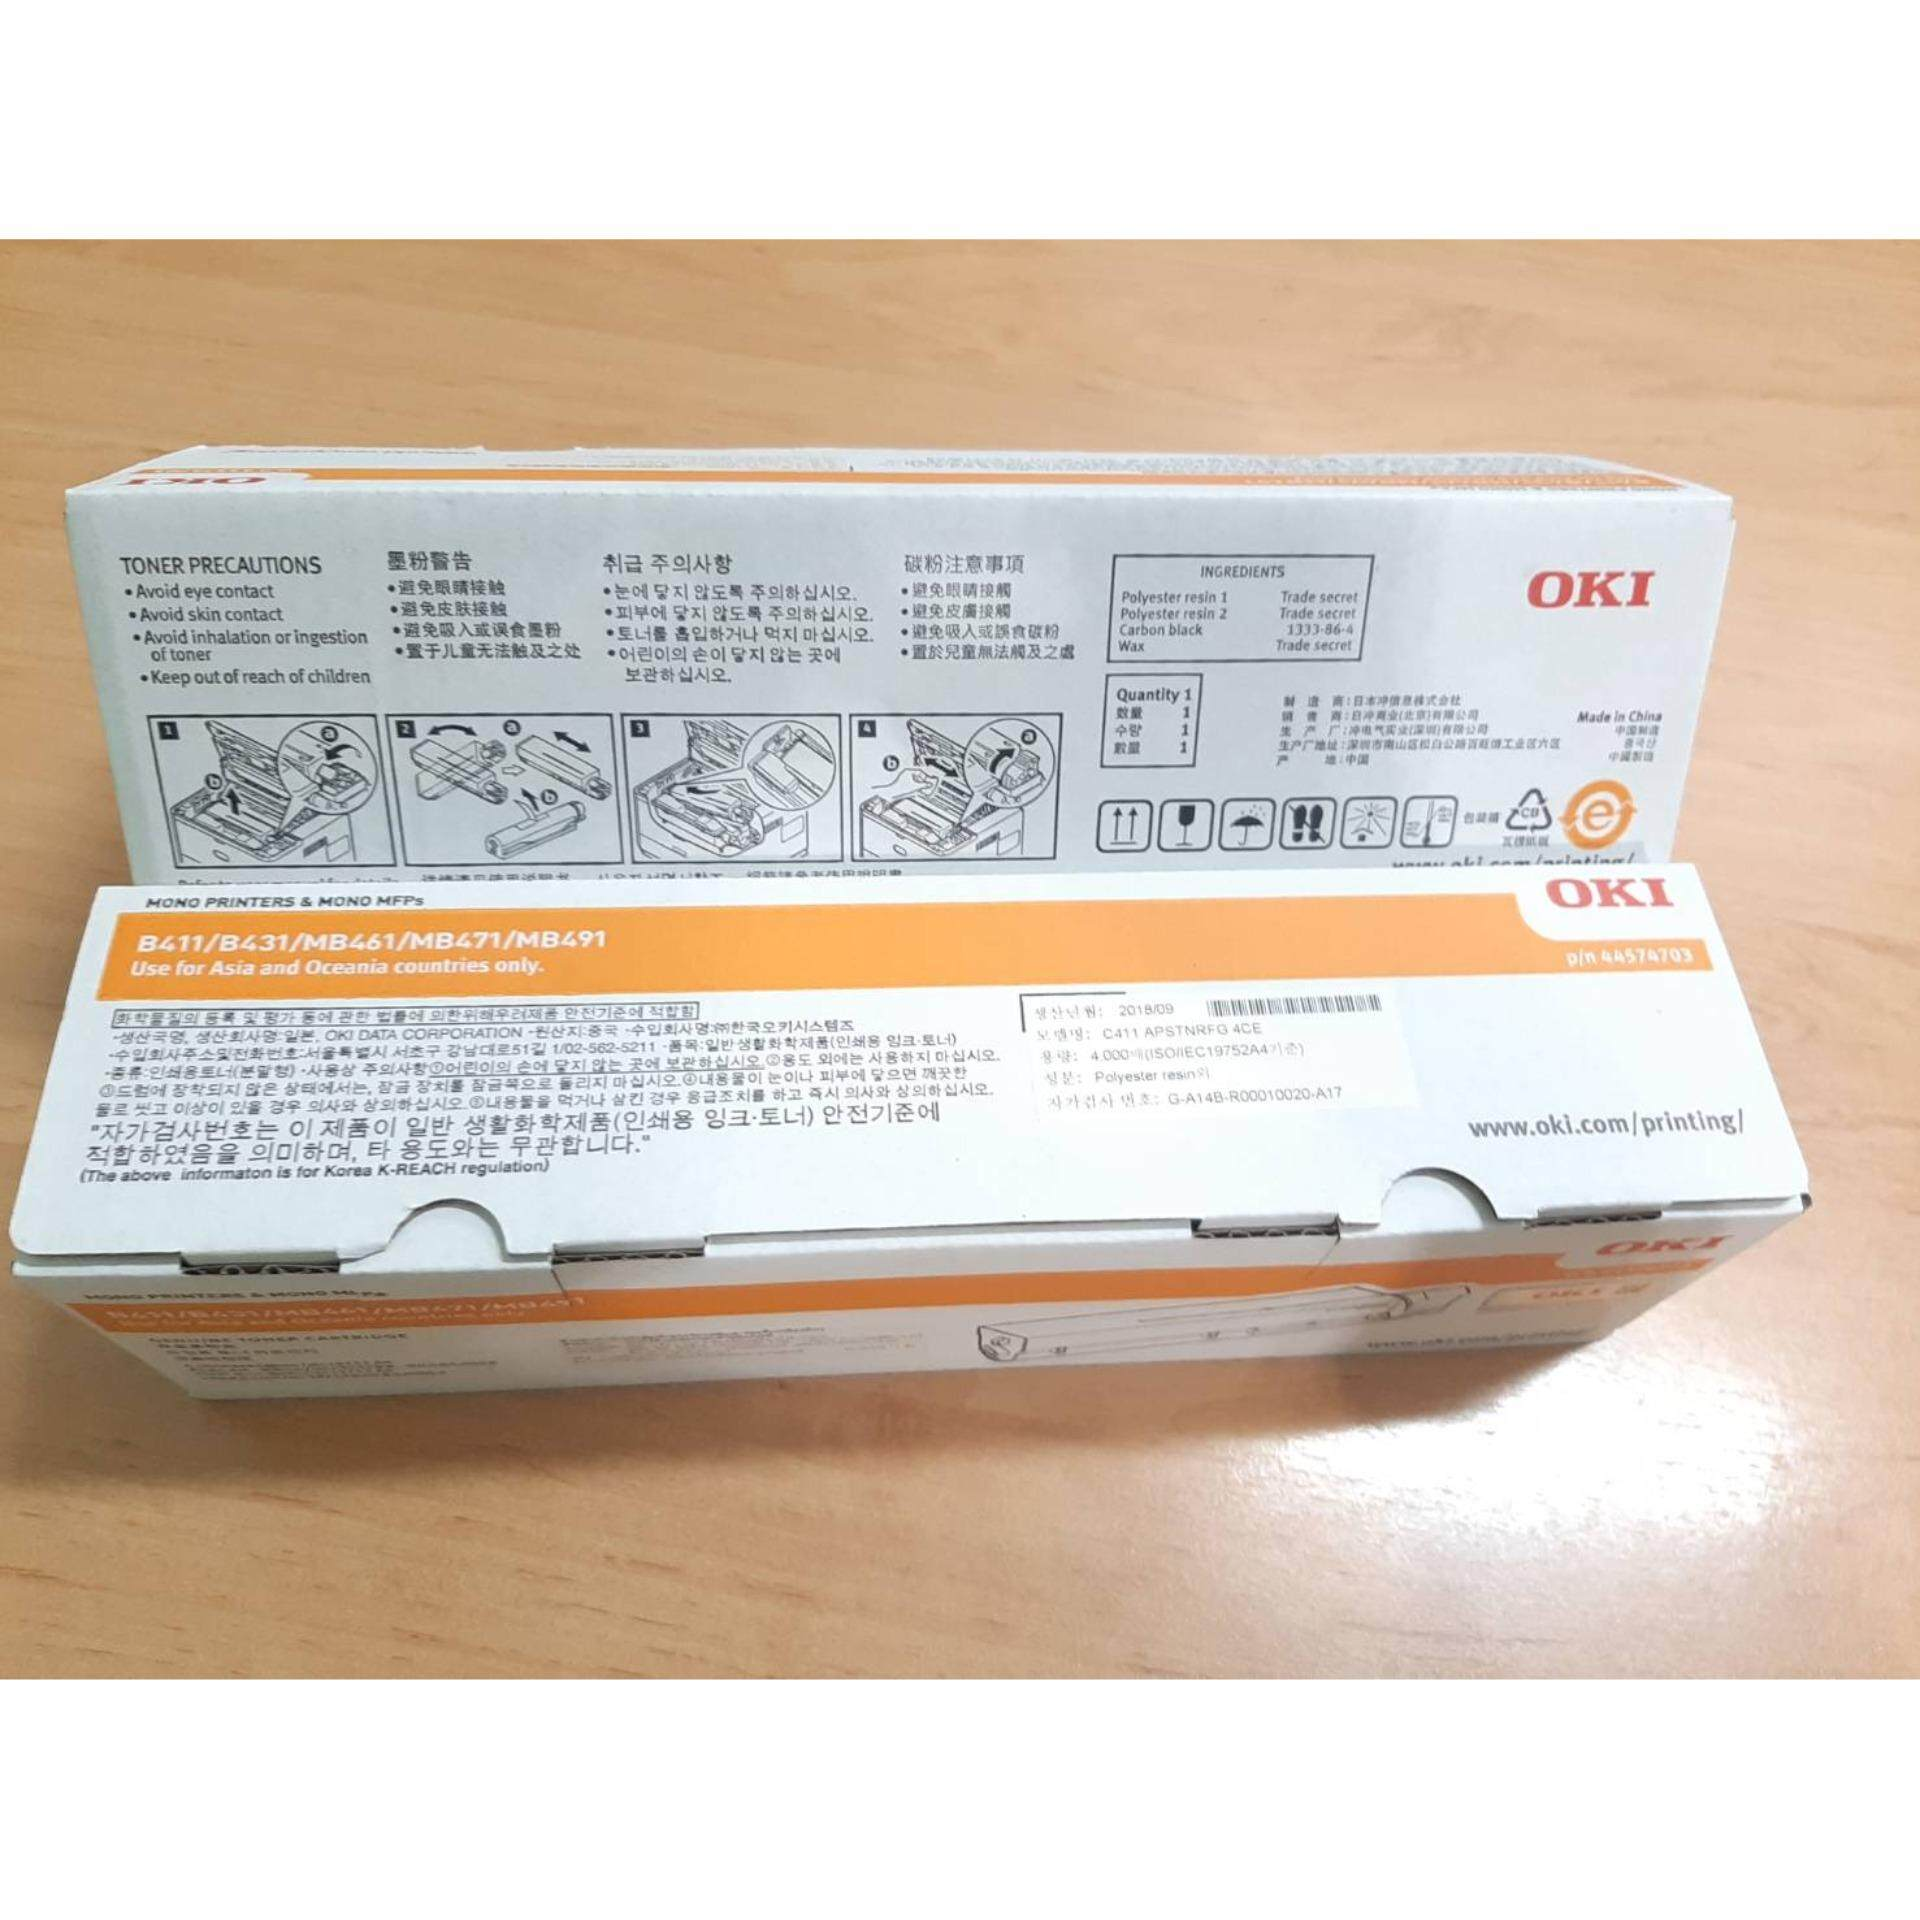 44574703 Oki Genuine Toner Cartridge - 4k (b411 / B431) By By Mary Shop.